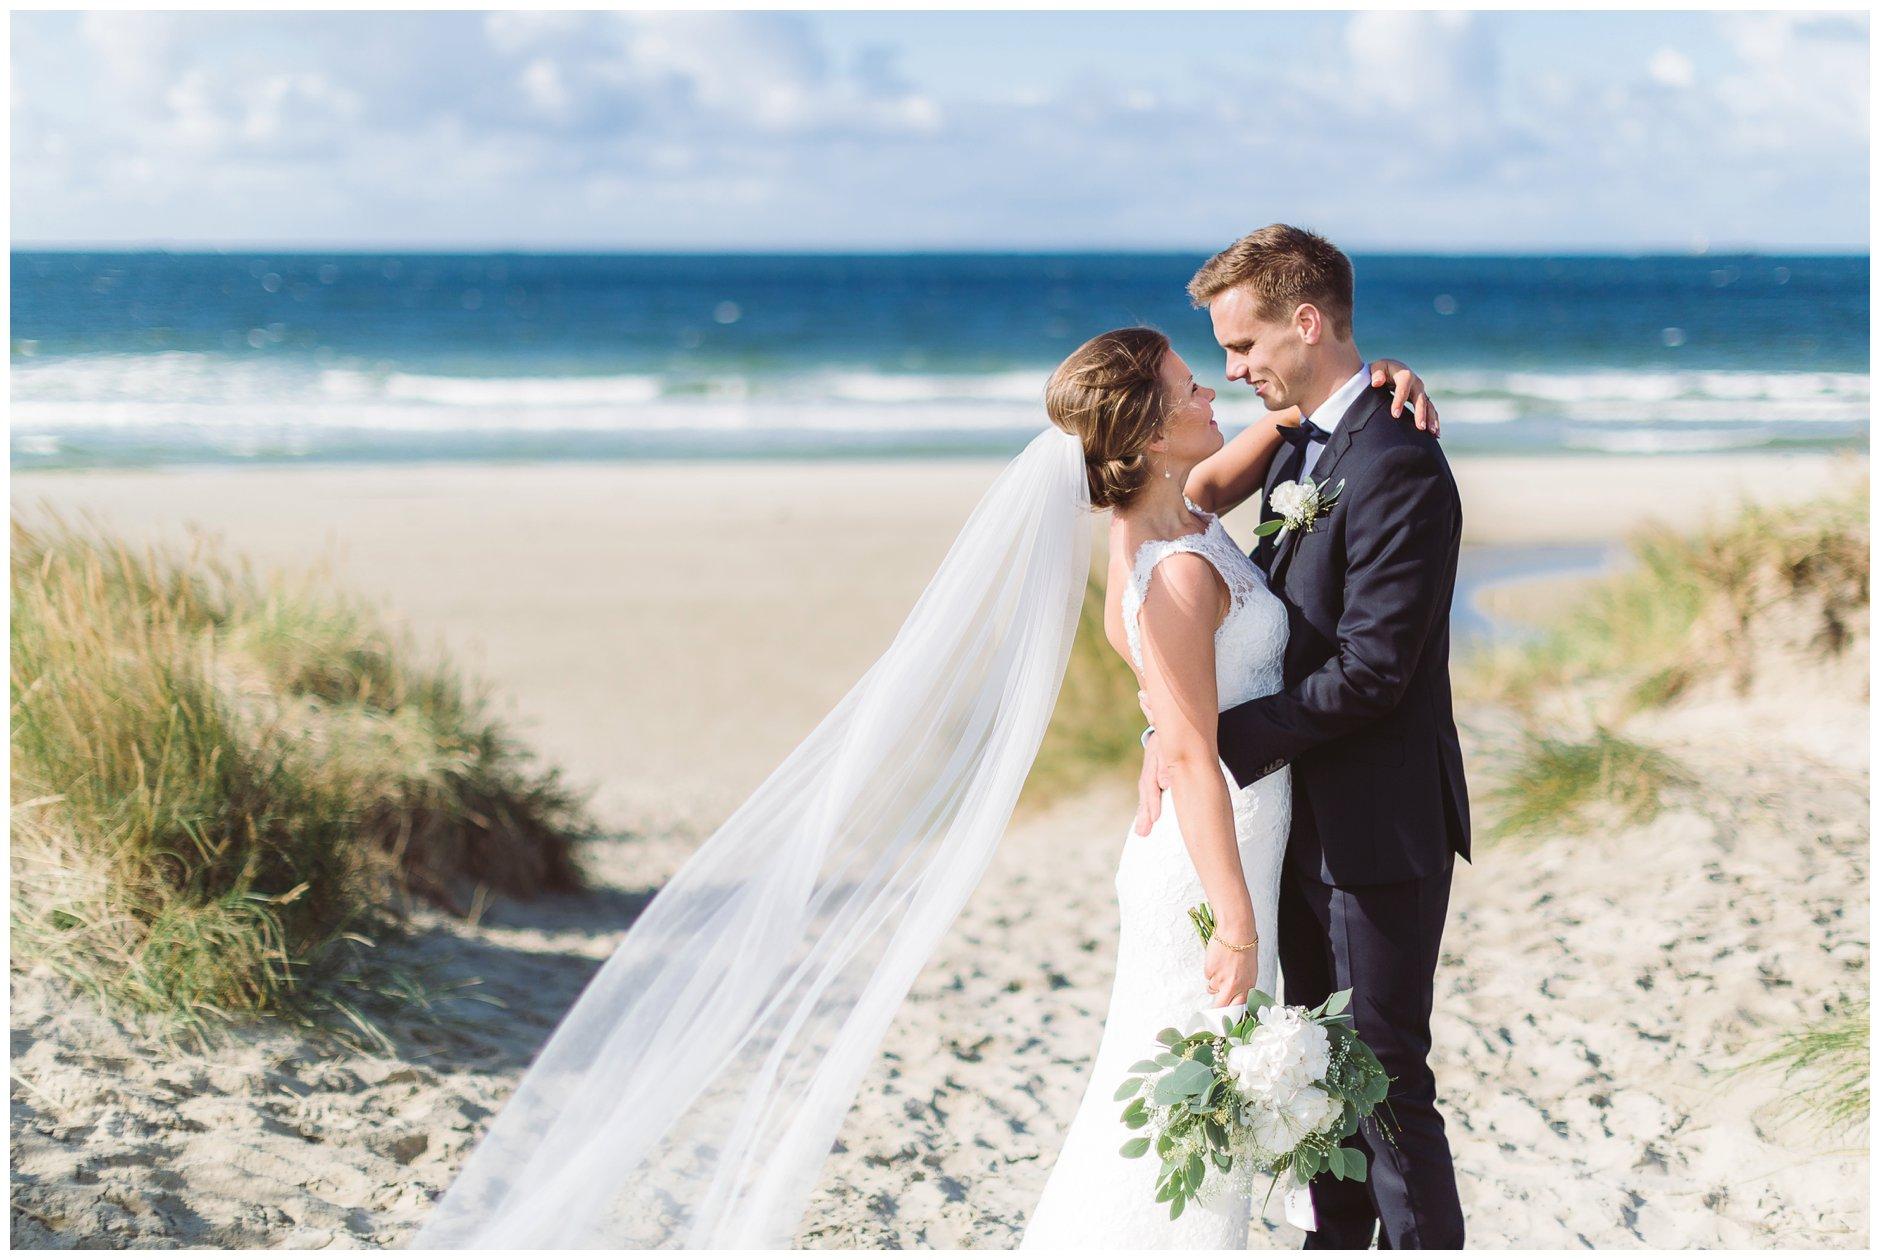 Bryllup på Jæren Sola stranden